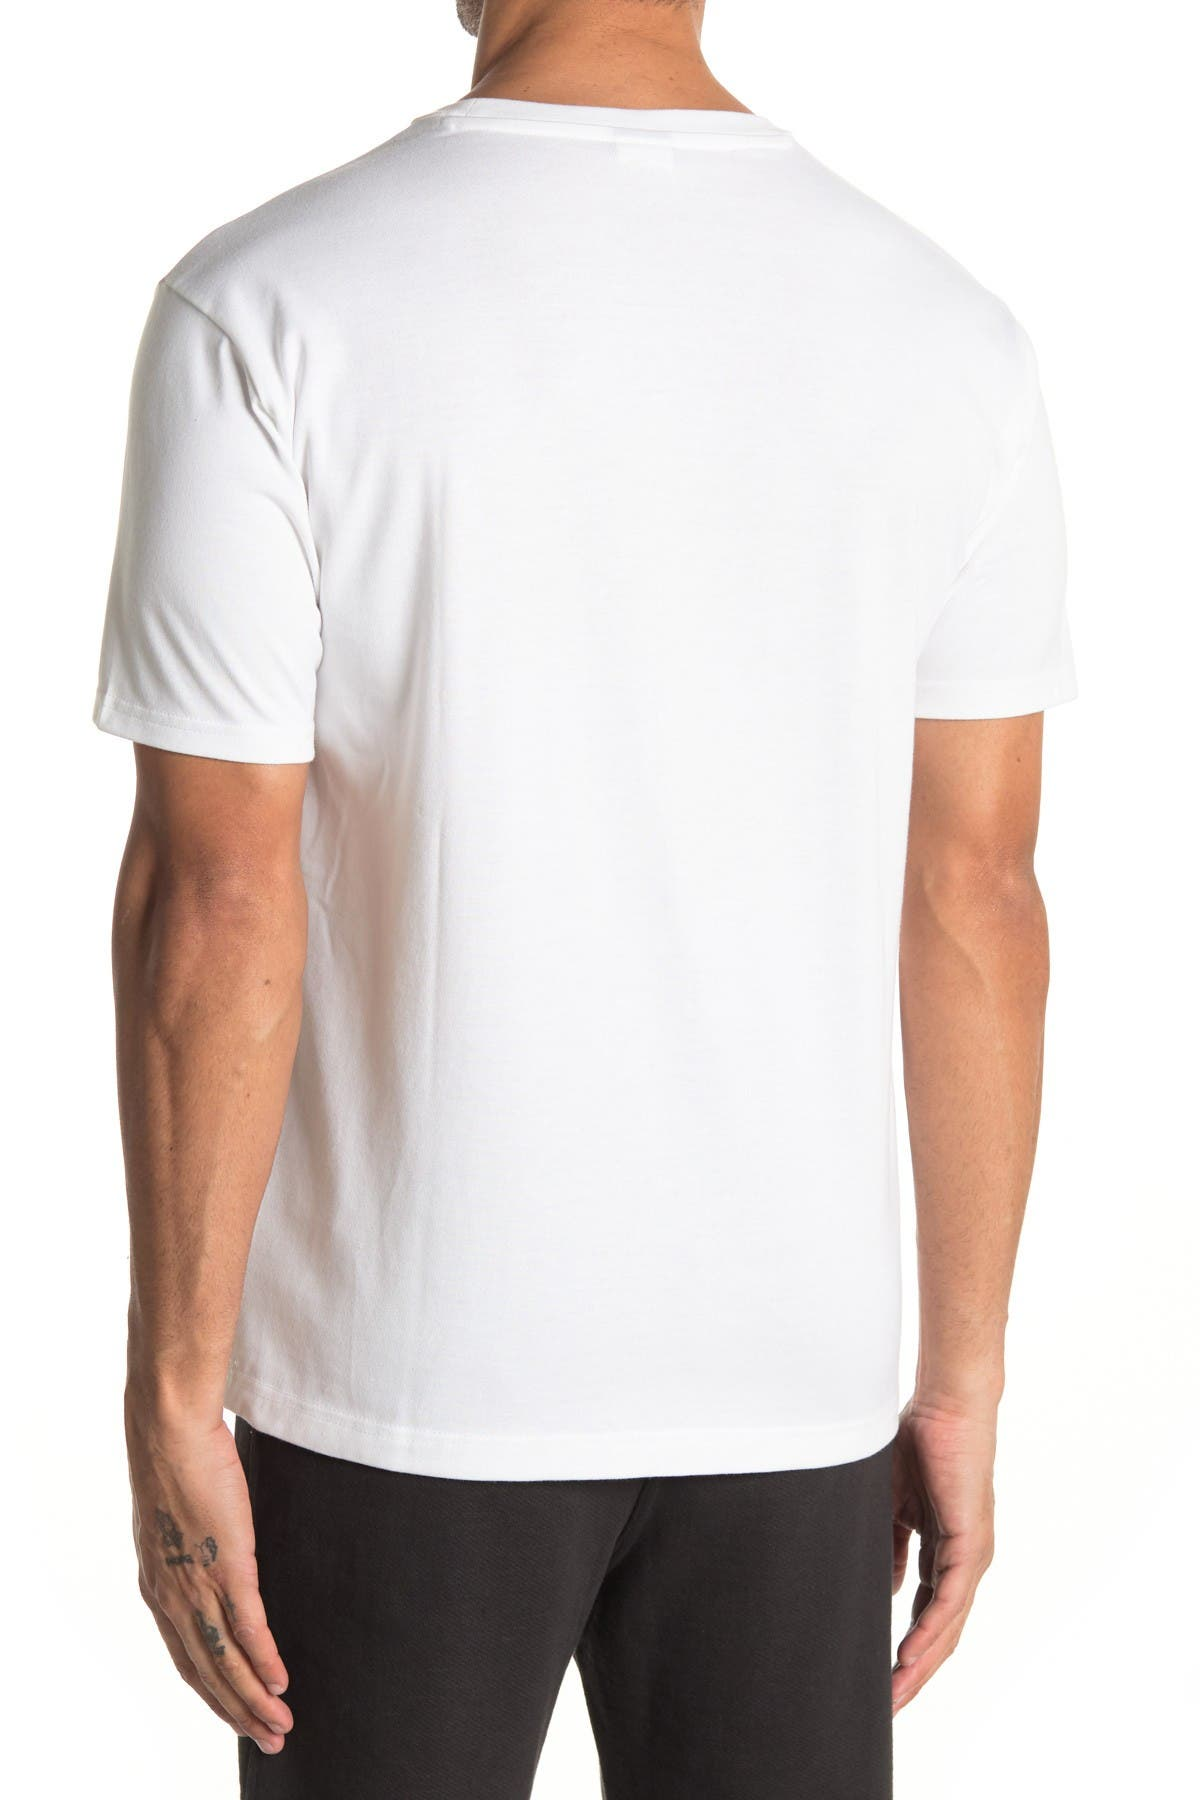 Image of New Balance Athletics N Graph Retro Runner T-Shirt